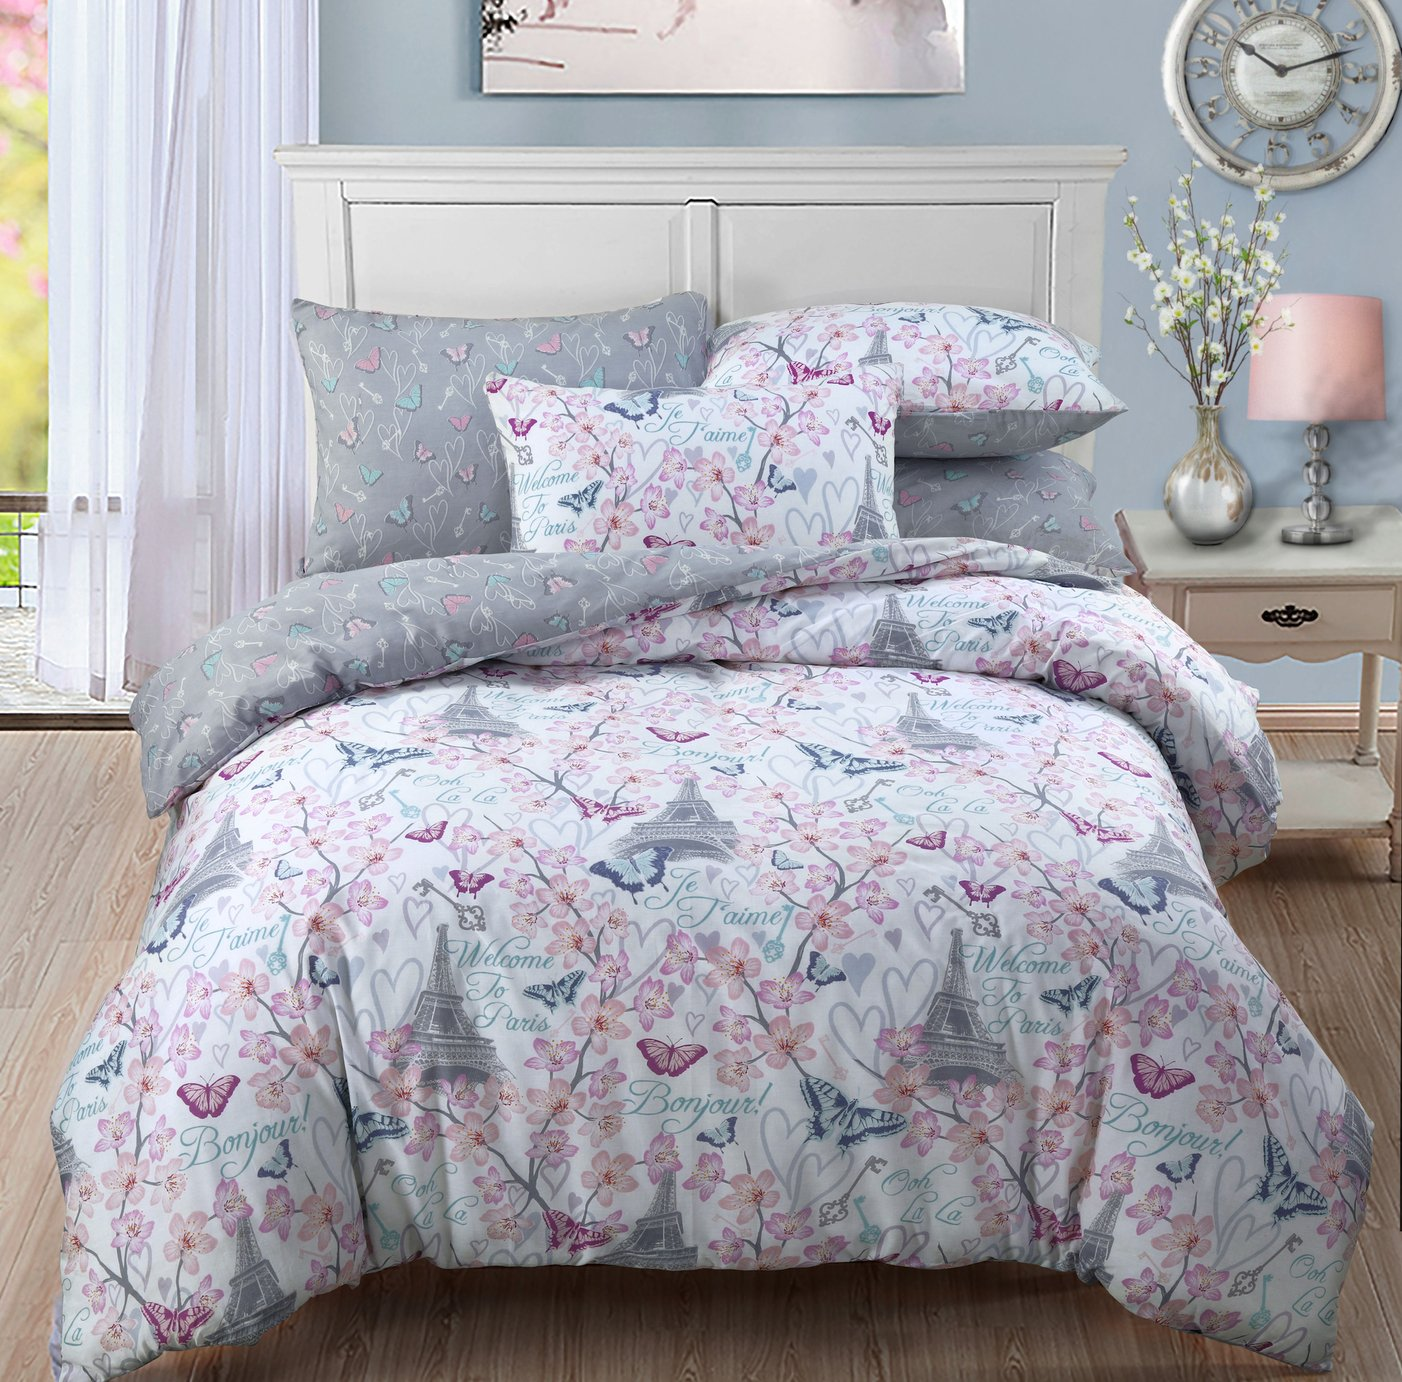 cherry blossom bedding set double. Black Bedroom Furniture Sets. Home Design Ideas